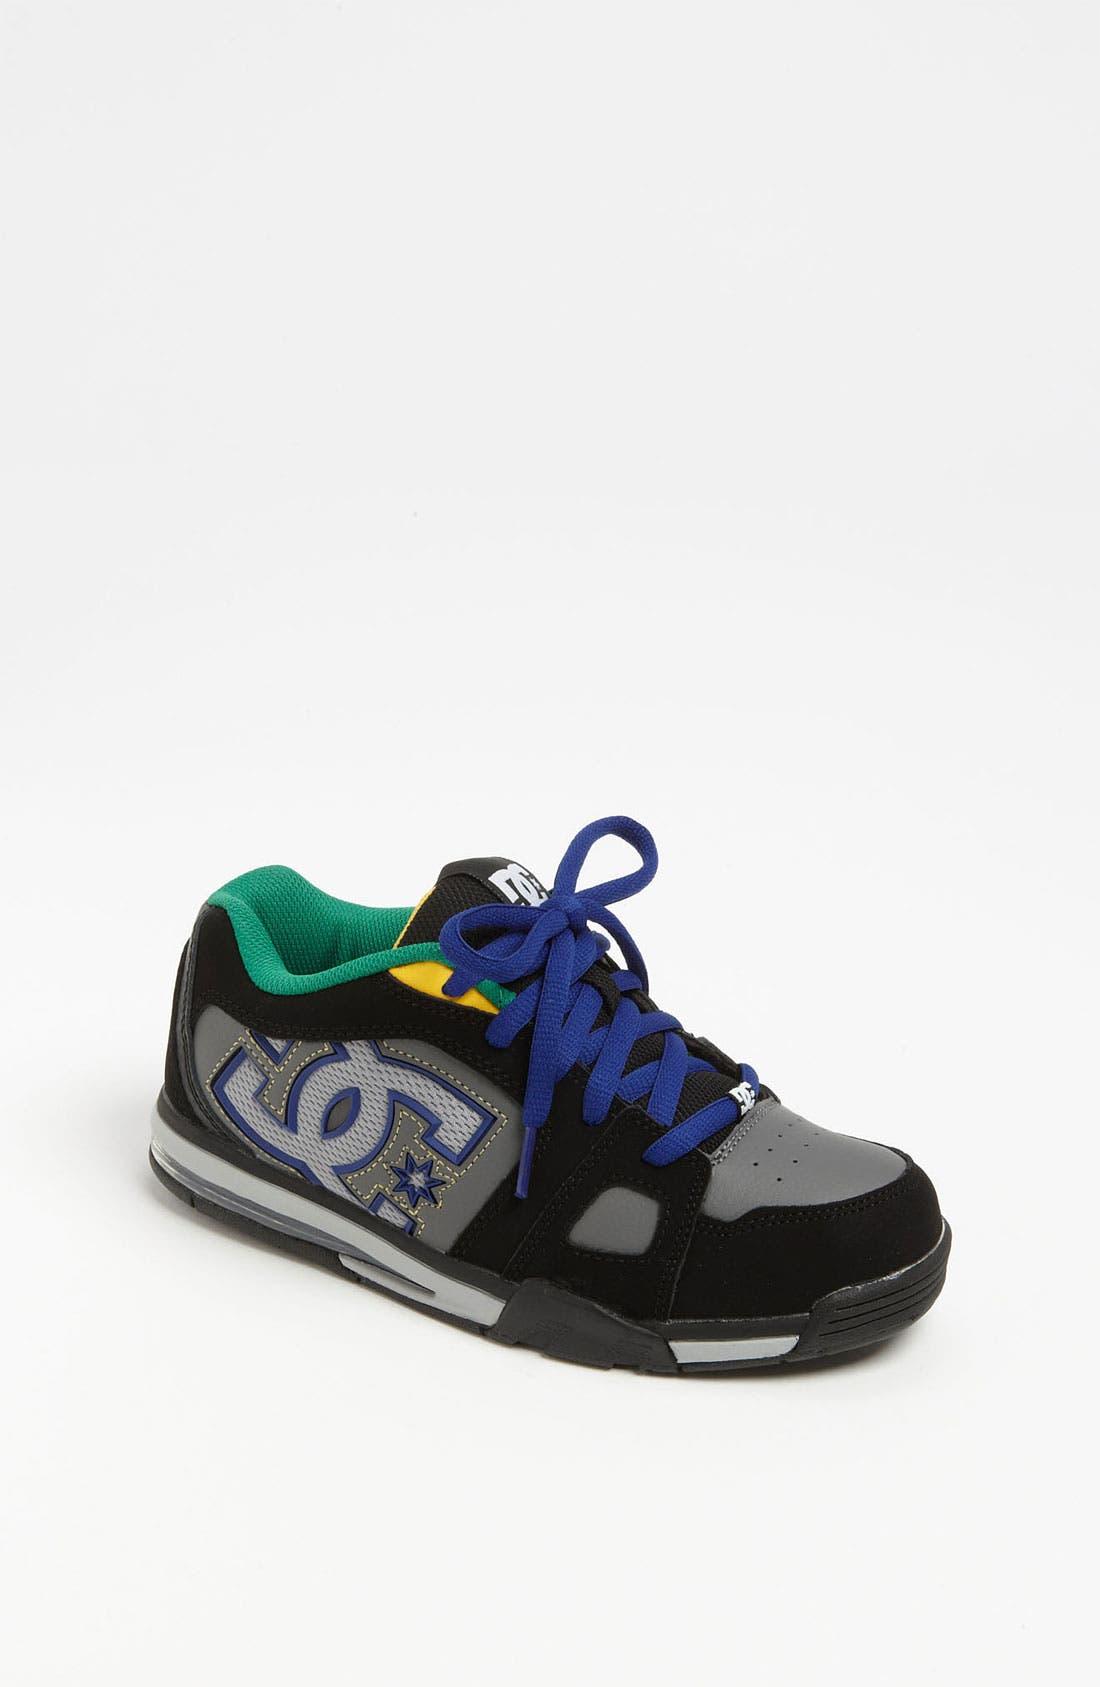 Alternate Image 1 Selected - DC Shoes 'Frenzy' Sneaker (Big Kid)